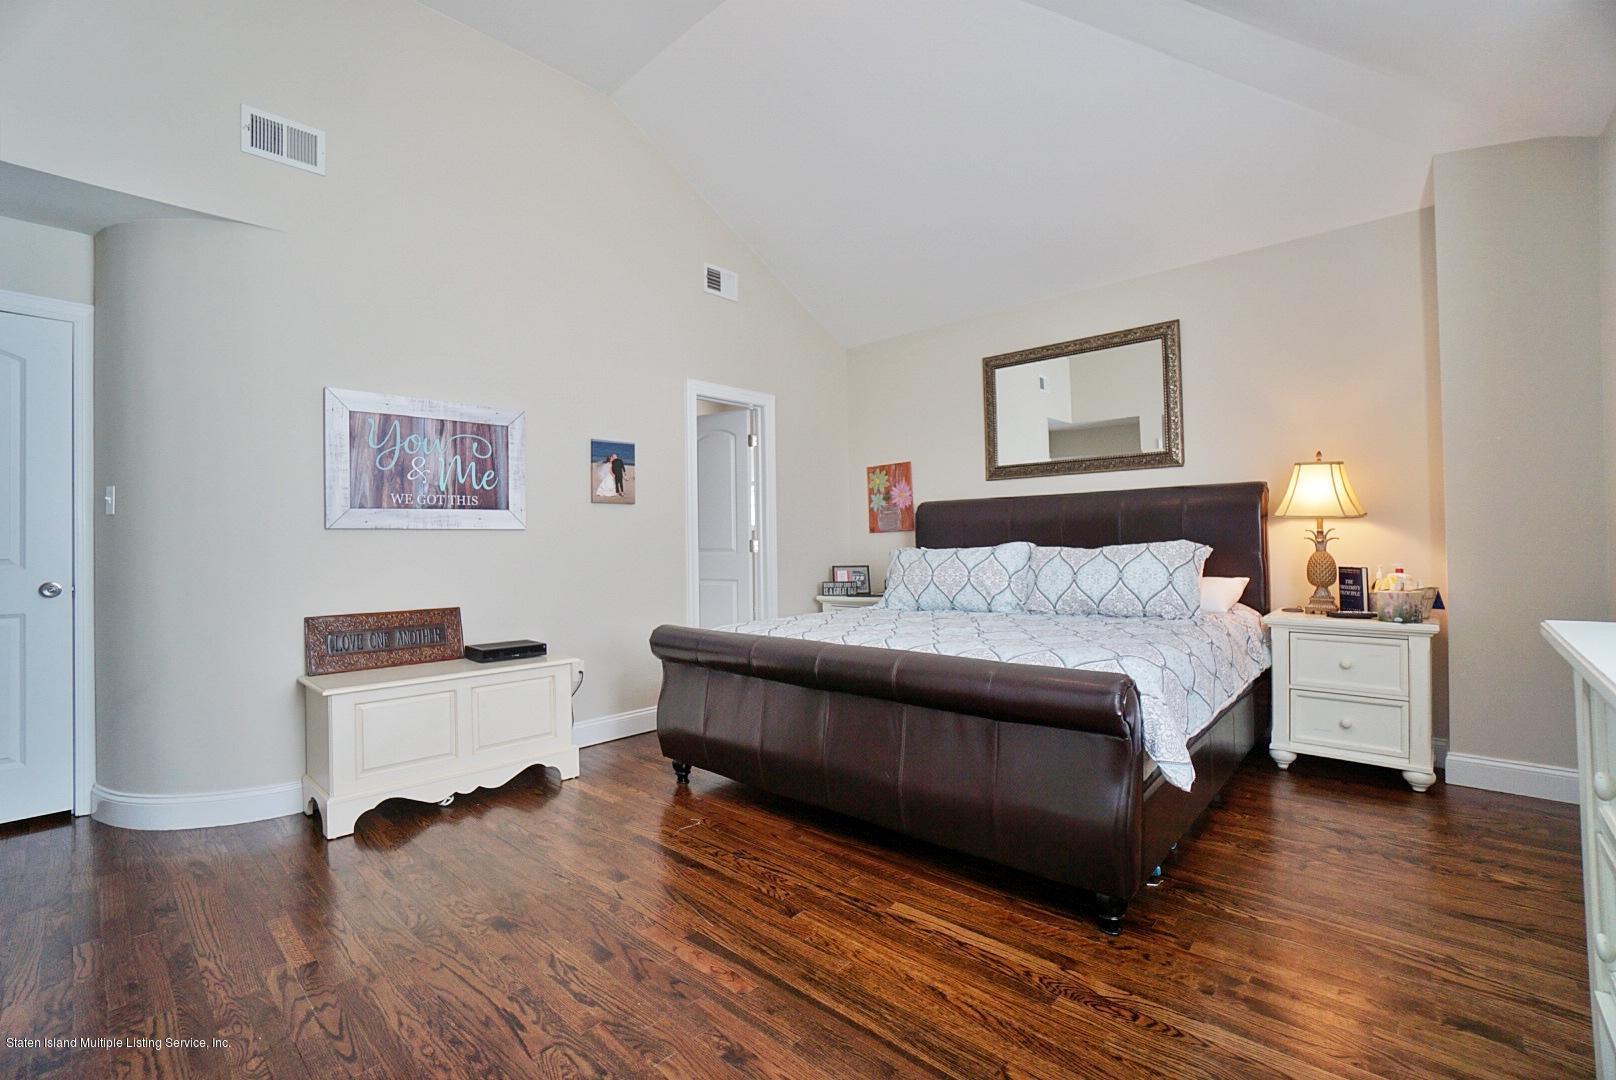 Two Family - Semi-Attached 27 Malibu Court  Staten Island, NY 10309, MLS-1129104-24